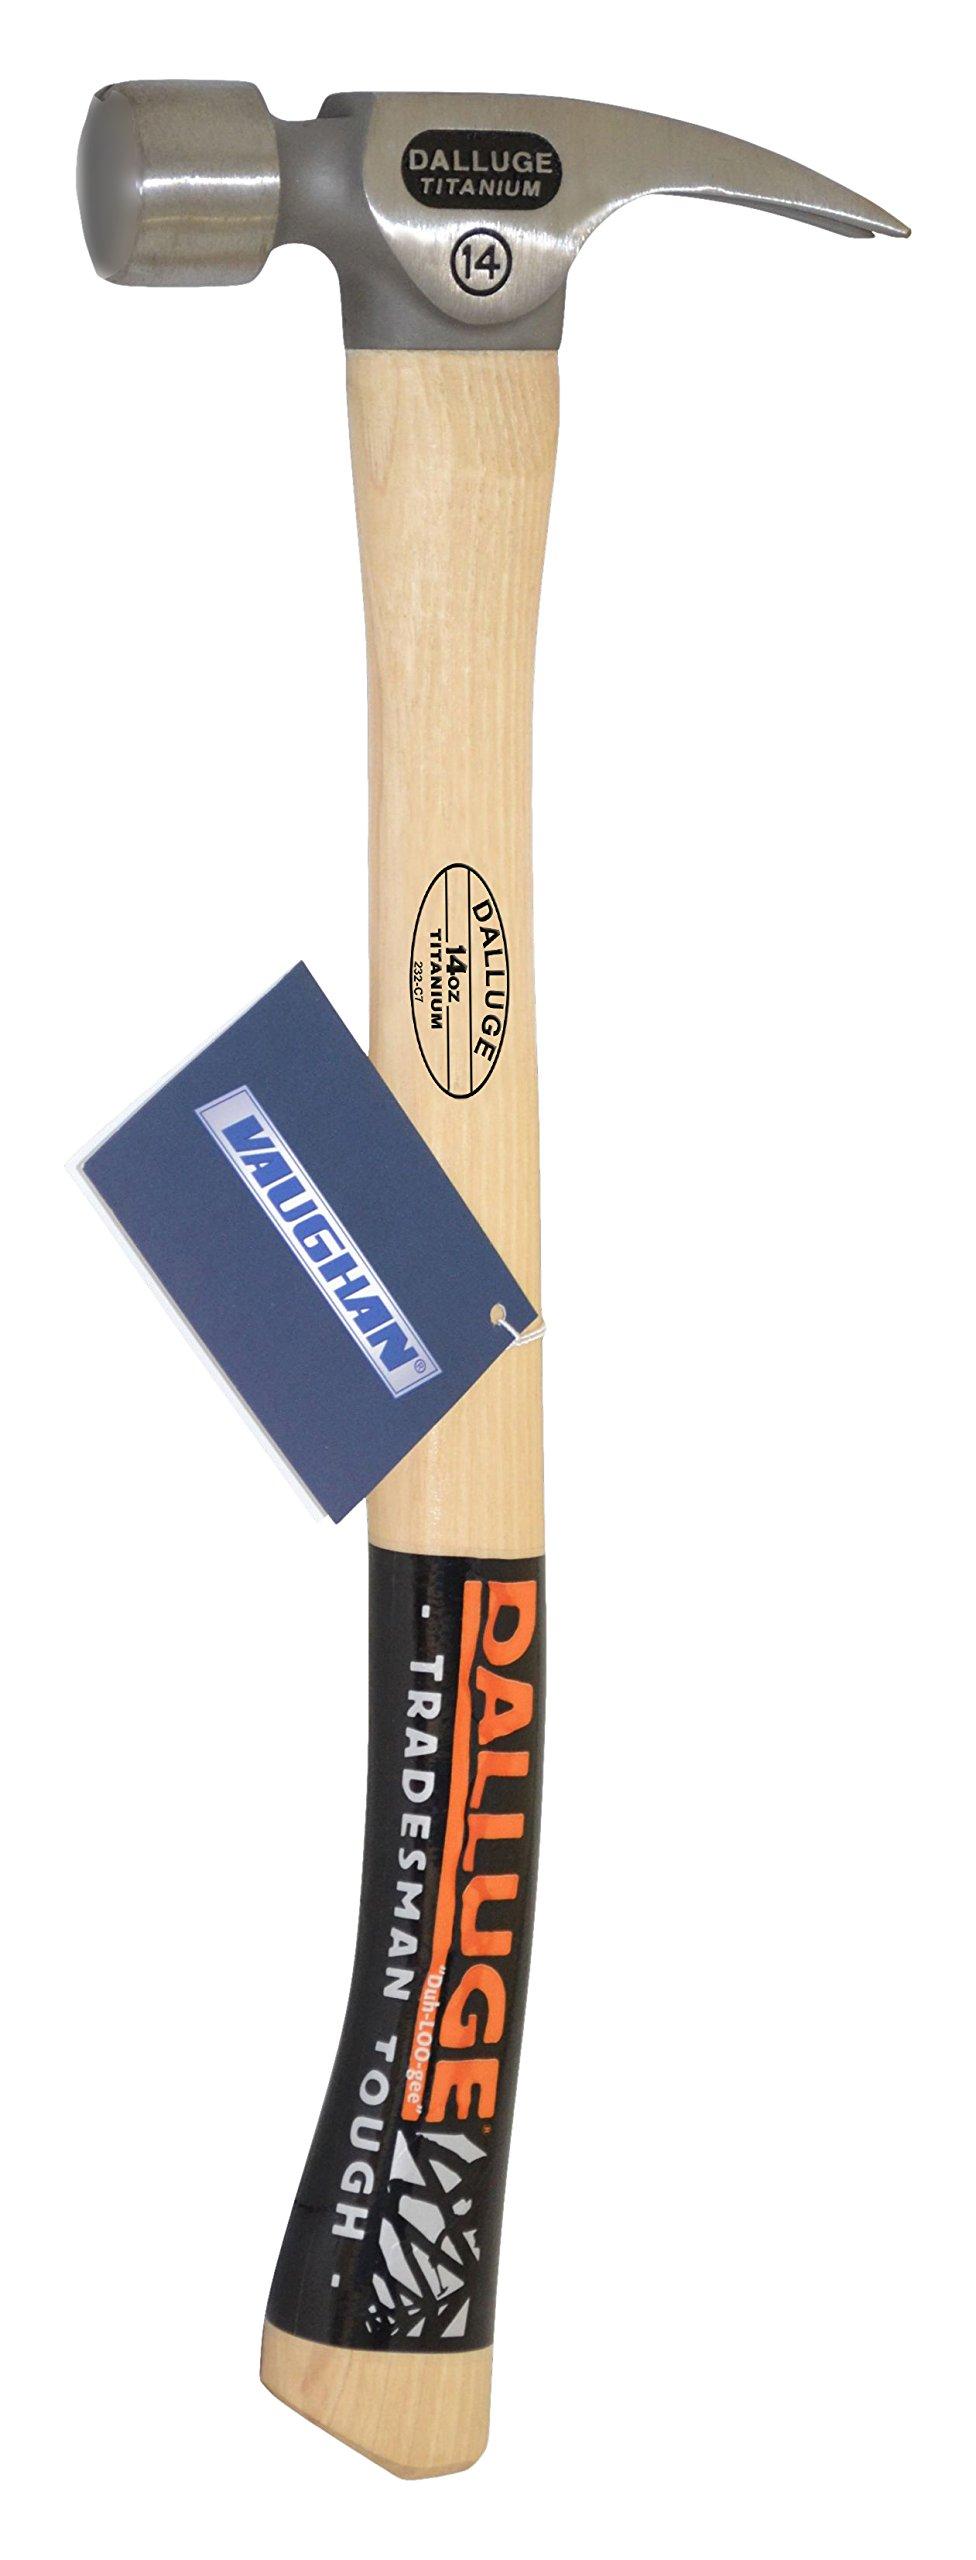 Dalluge 14oz Titanium Hammer, Smooth Face Axe Handle #07176